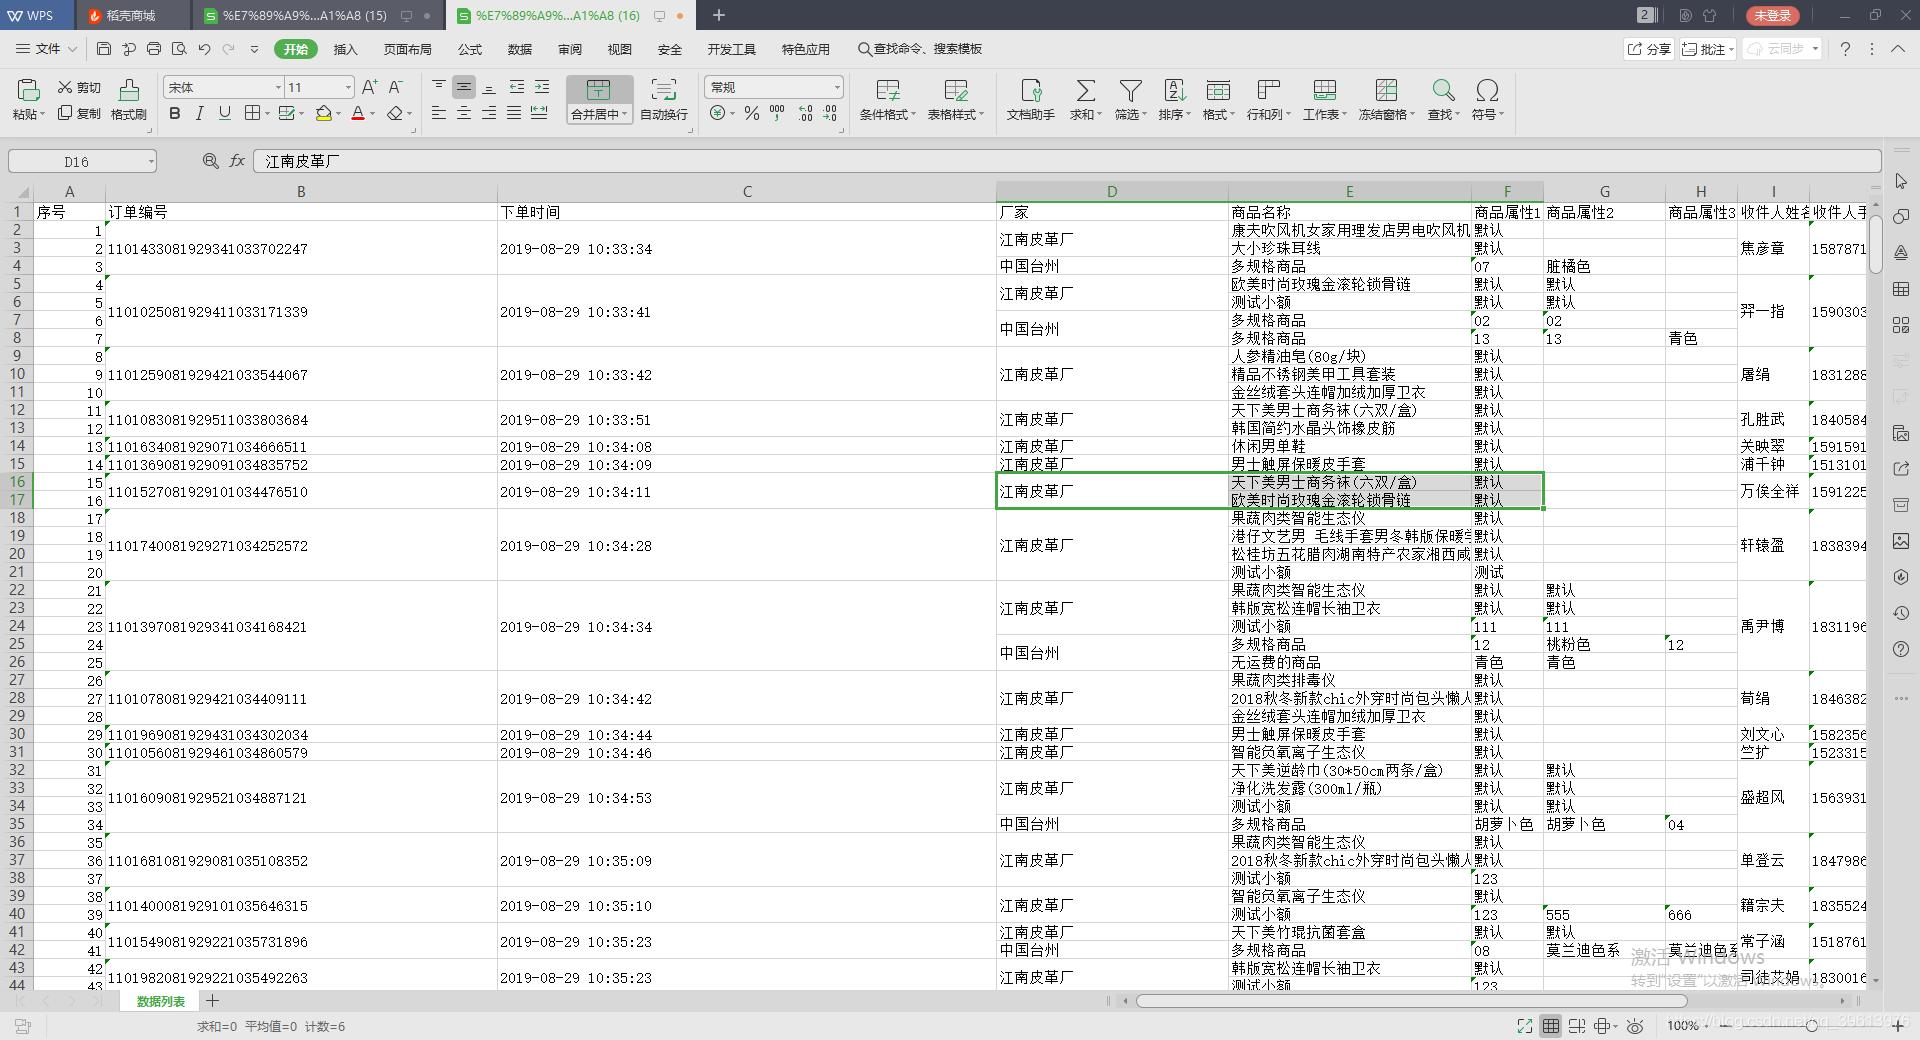 [JAVA]java 使用 poi 导出Excel 根据相同内容动态合并单元格可指定列合并